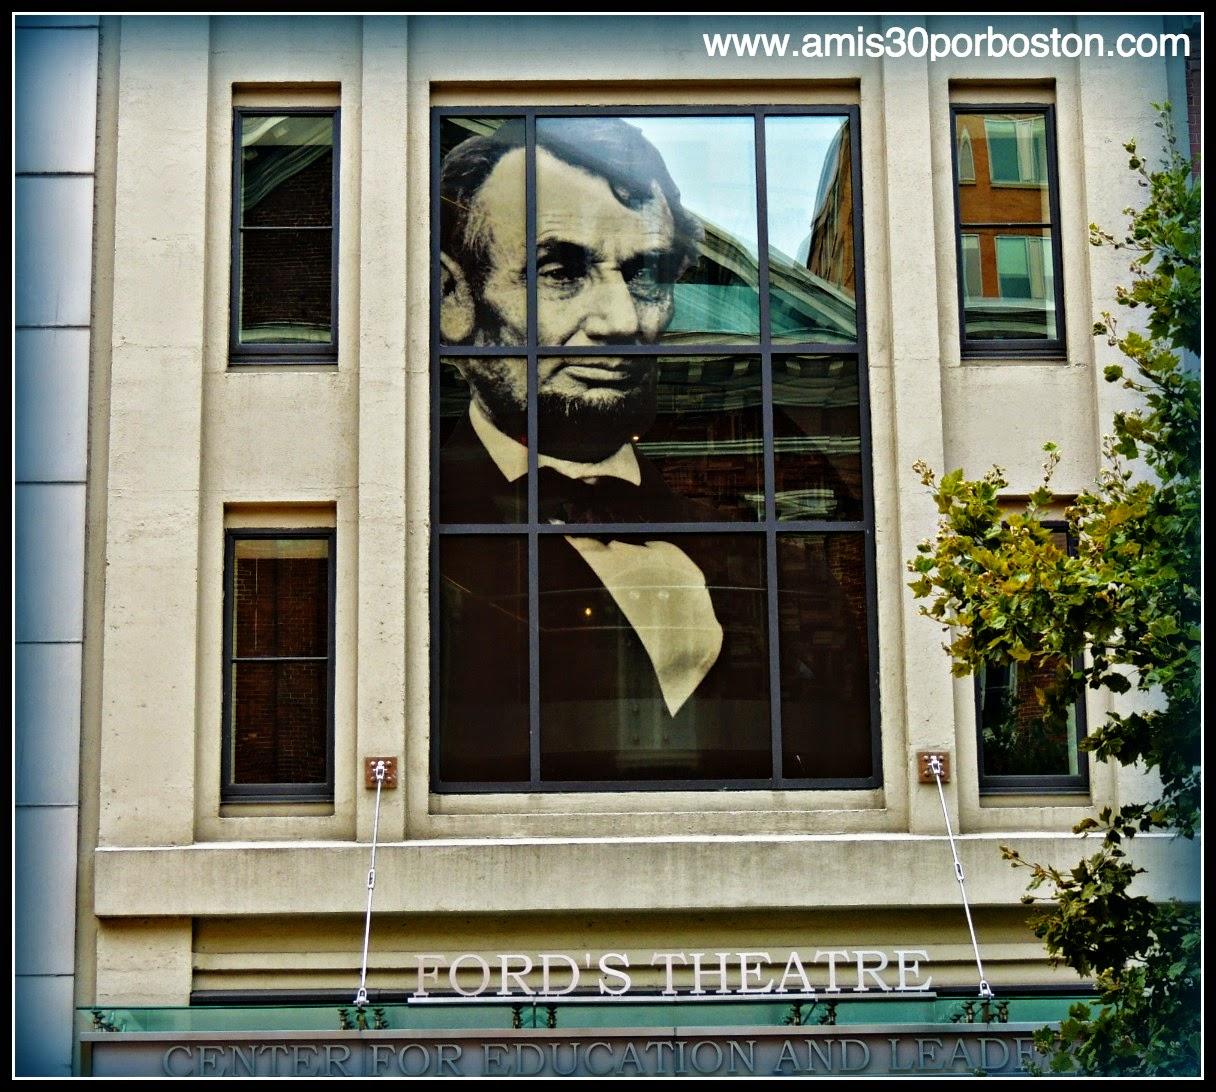 Teatro Ford: Lugar del Asesinado del Presidente Abraham Lincoln